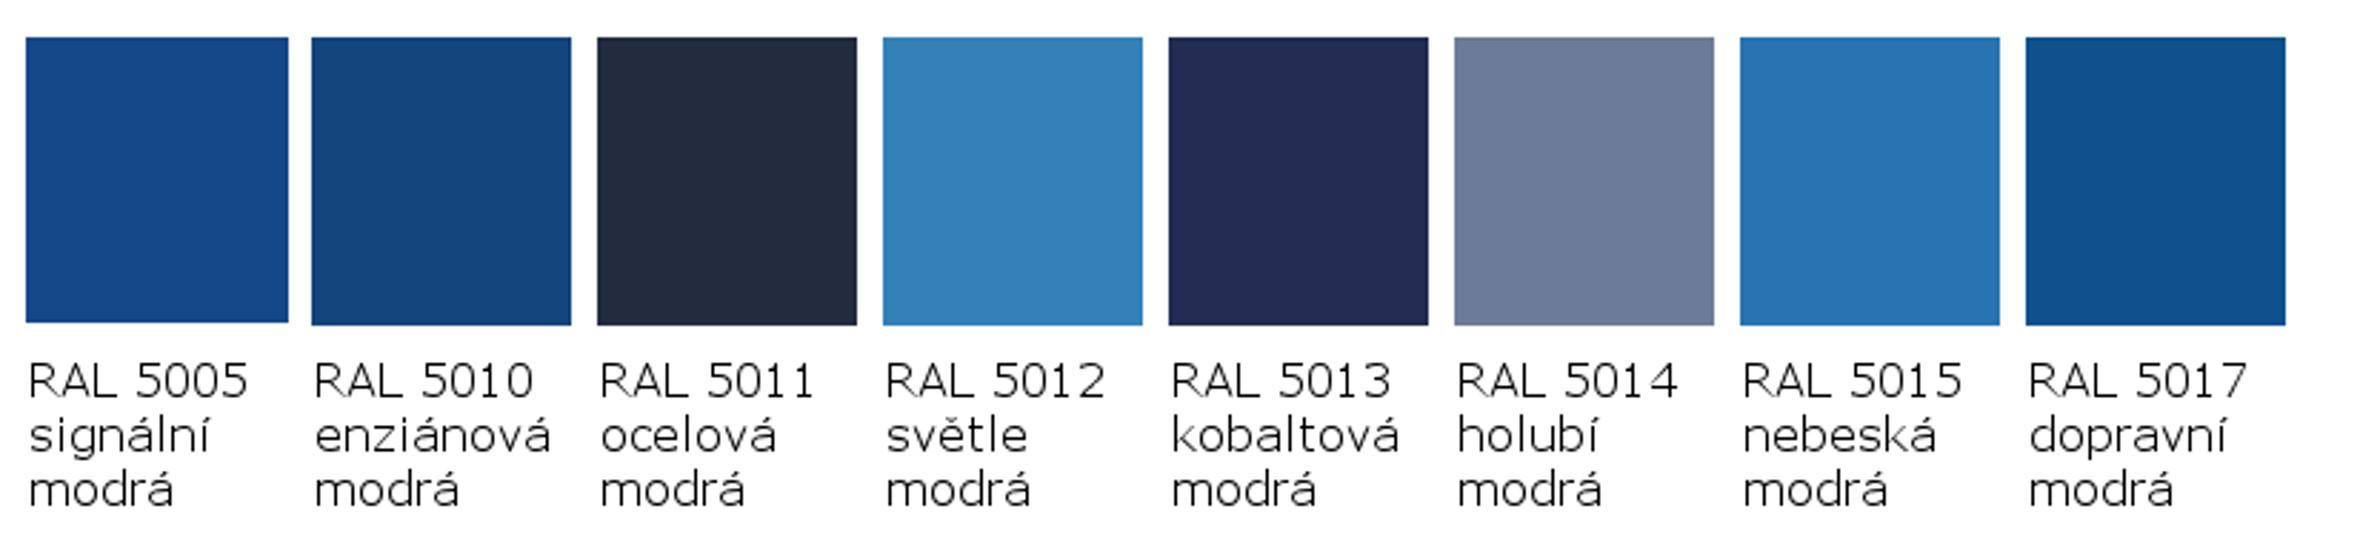 RAL 5005 - RAL 5017